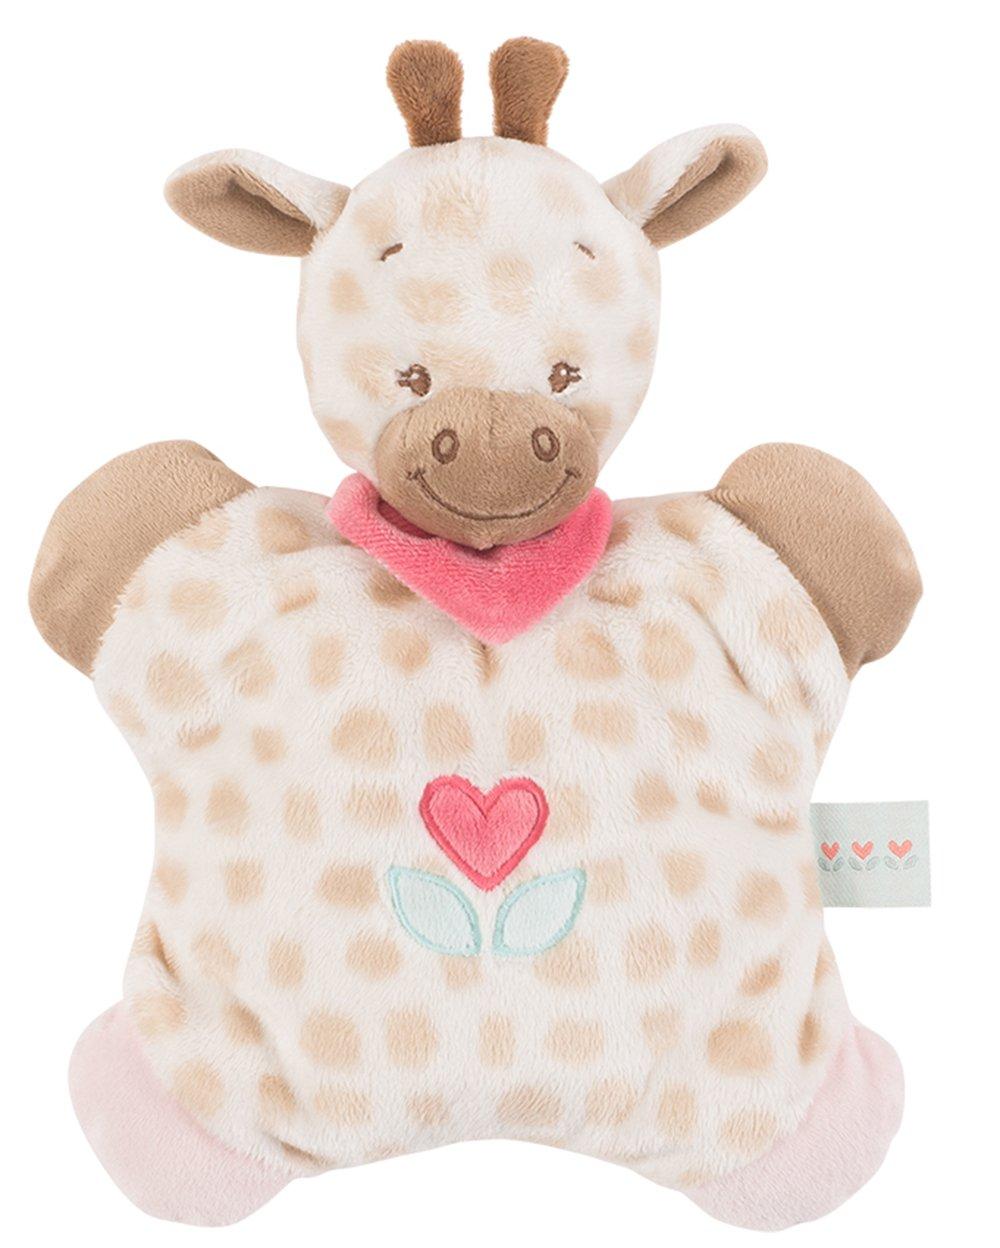 Nattou - Doudou plano con sonajero jirafa charlotte blanco/beige: Amazon.es: Bebé